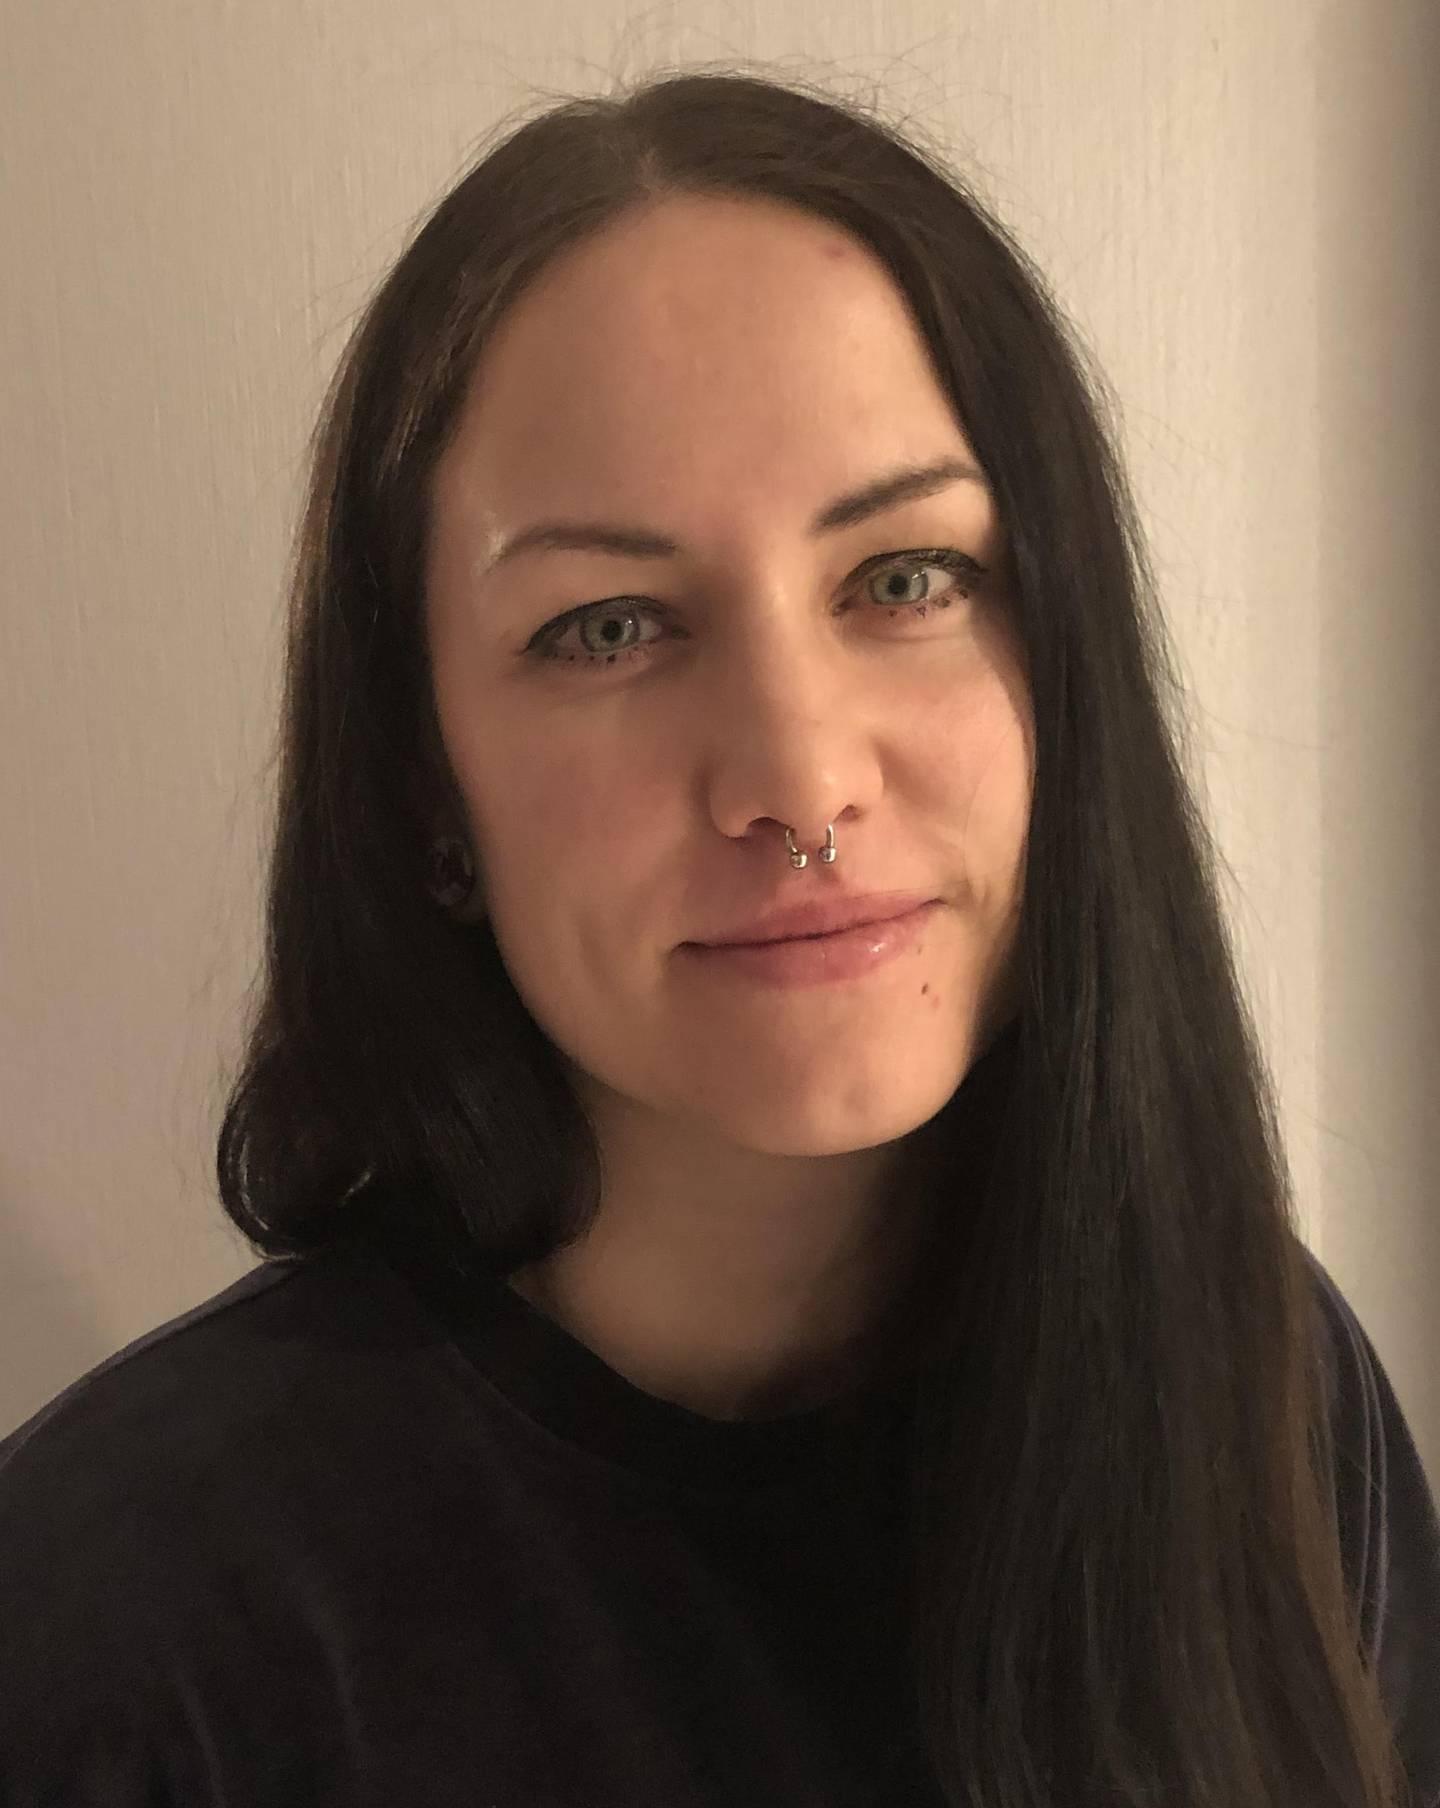 Madeleine Nor, kristen og frivillig i NOAH